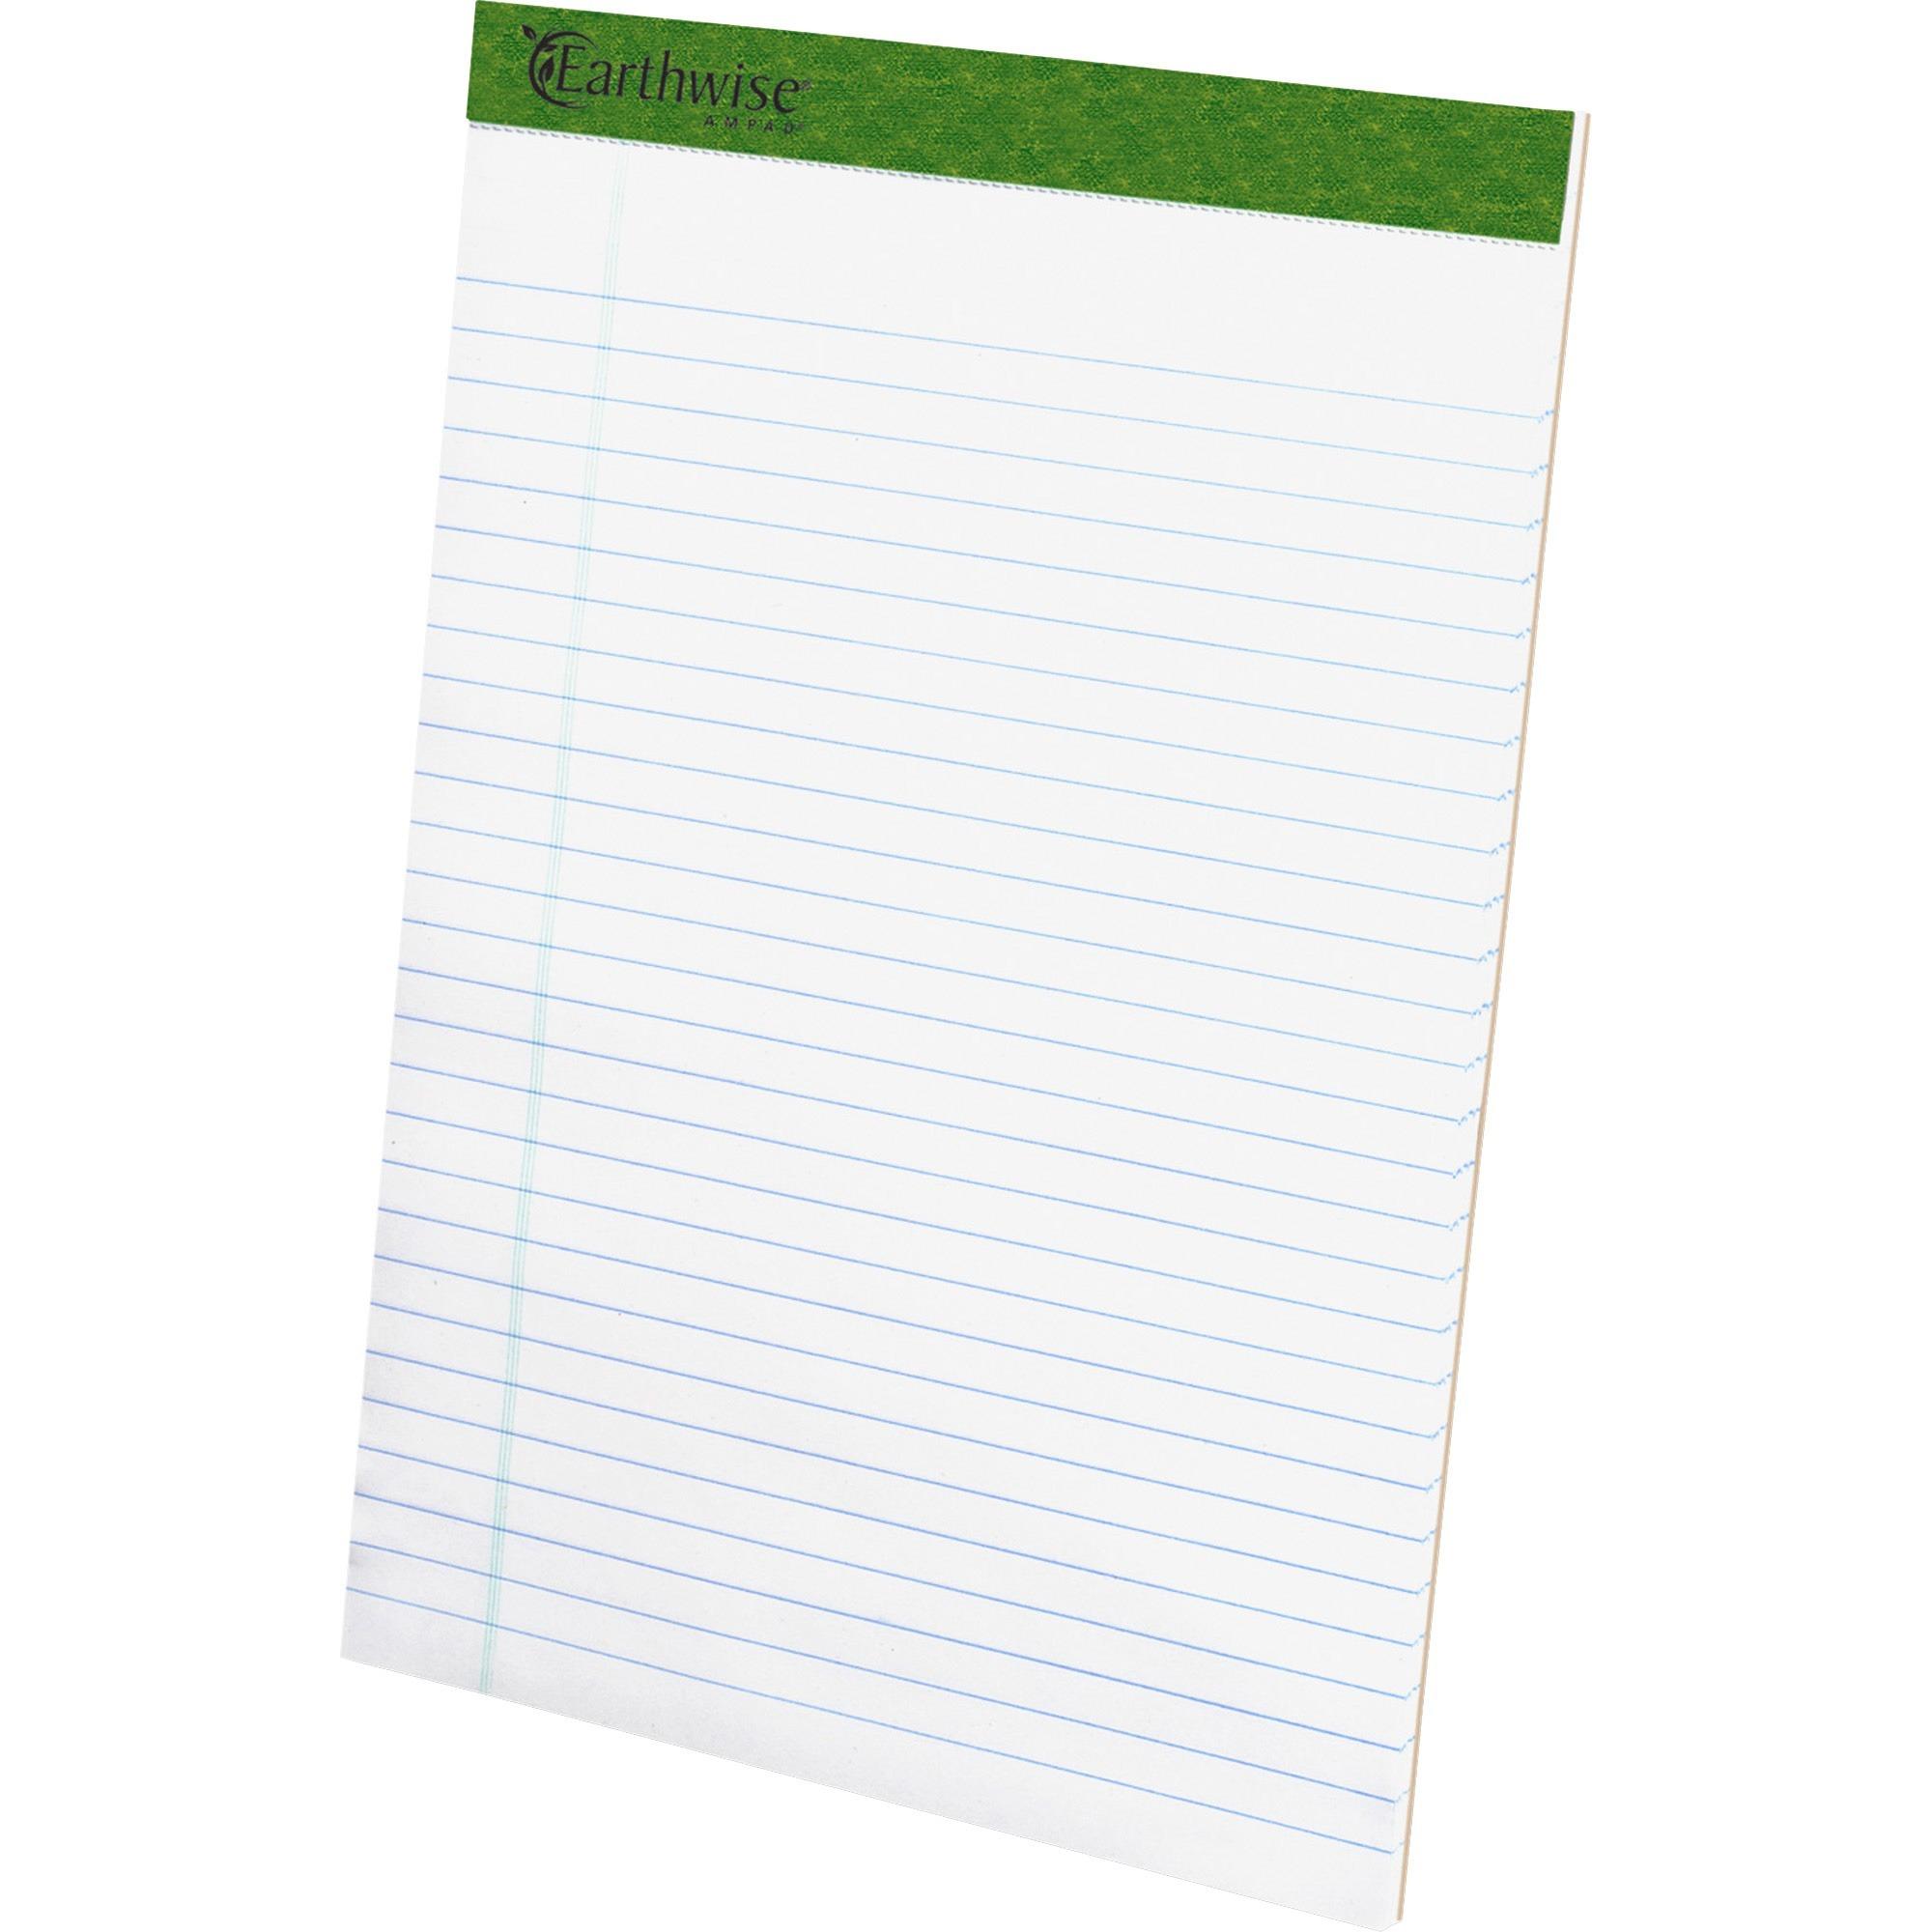 Earthwise Recycled Writing Pad, 8 1/2 x 11 3/4, White, Dozen